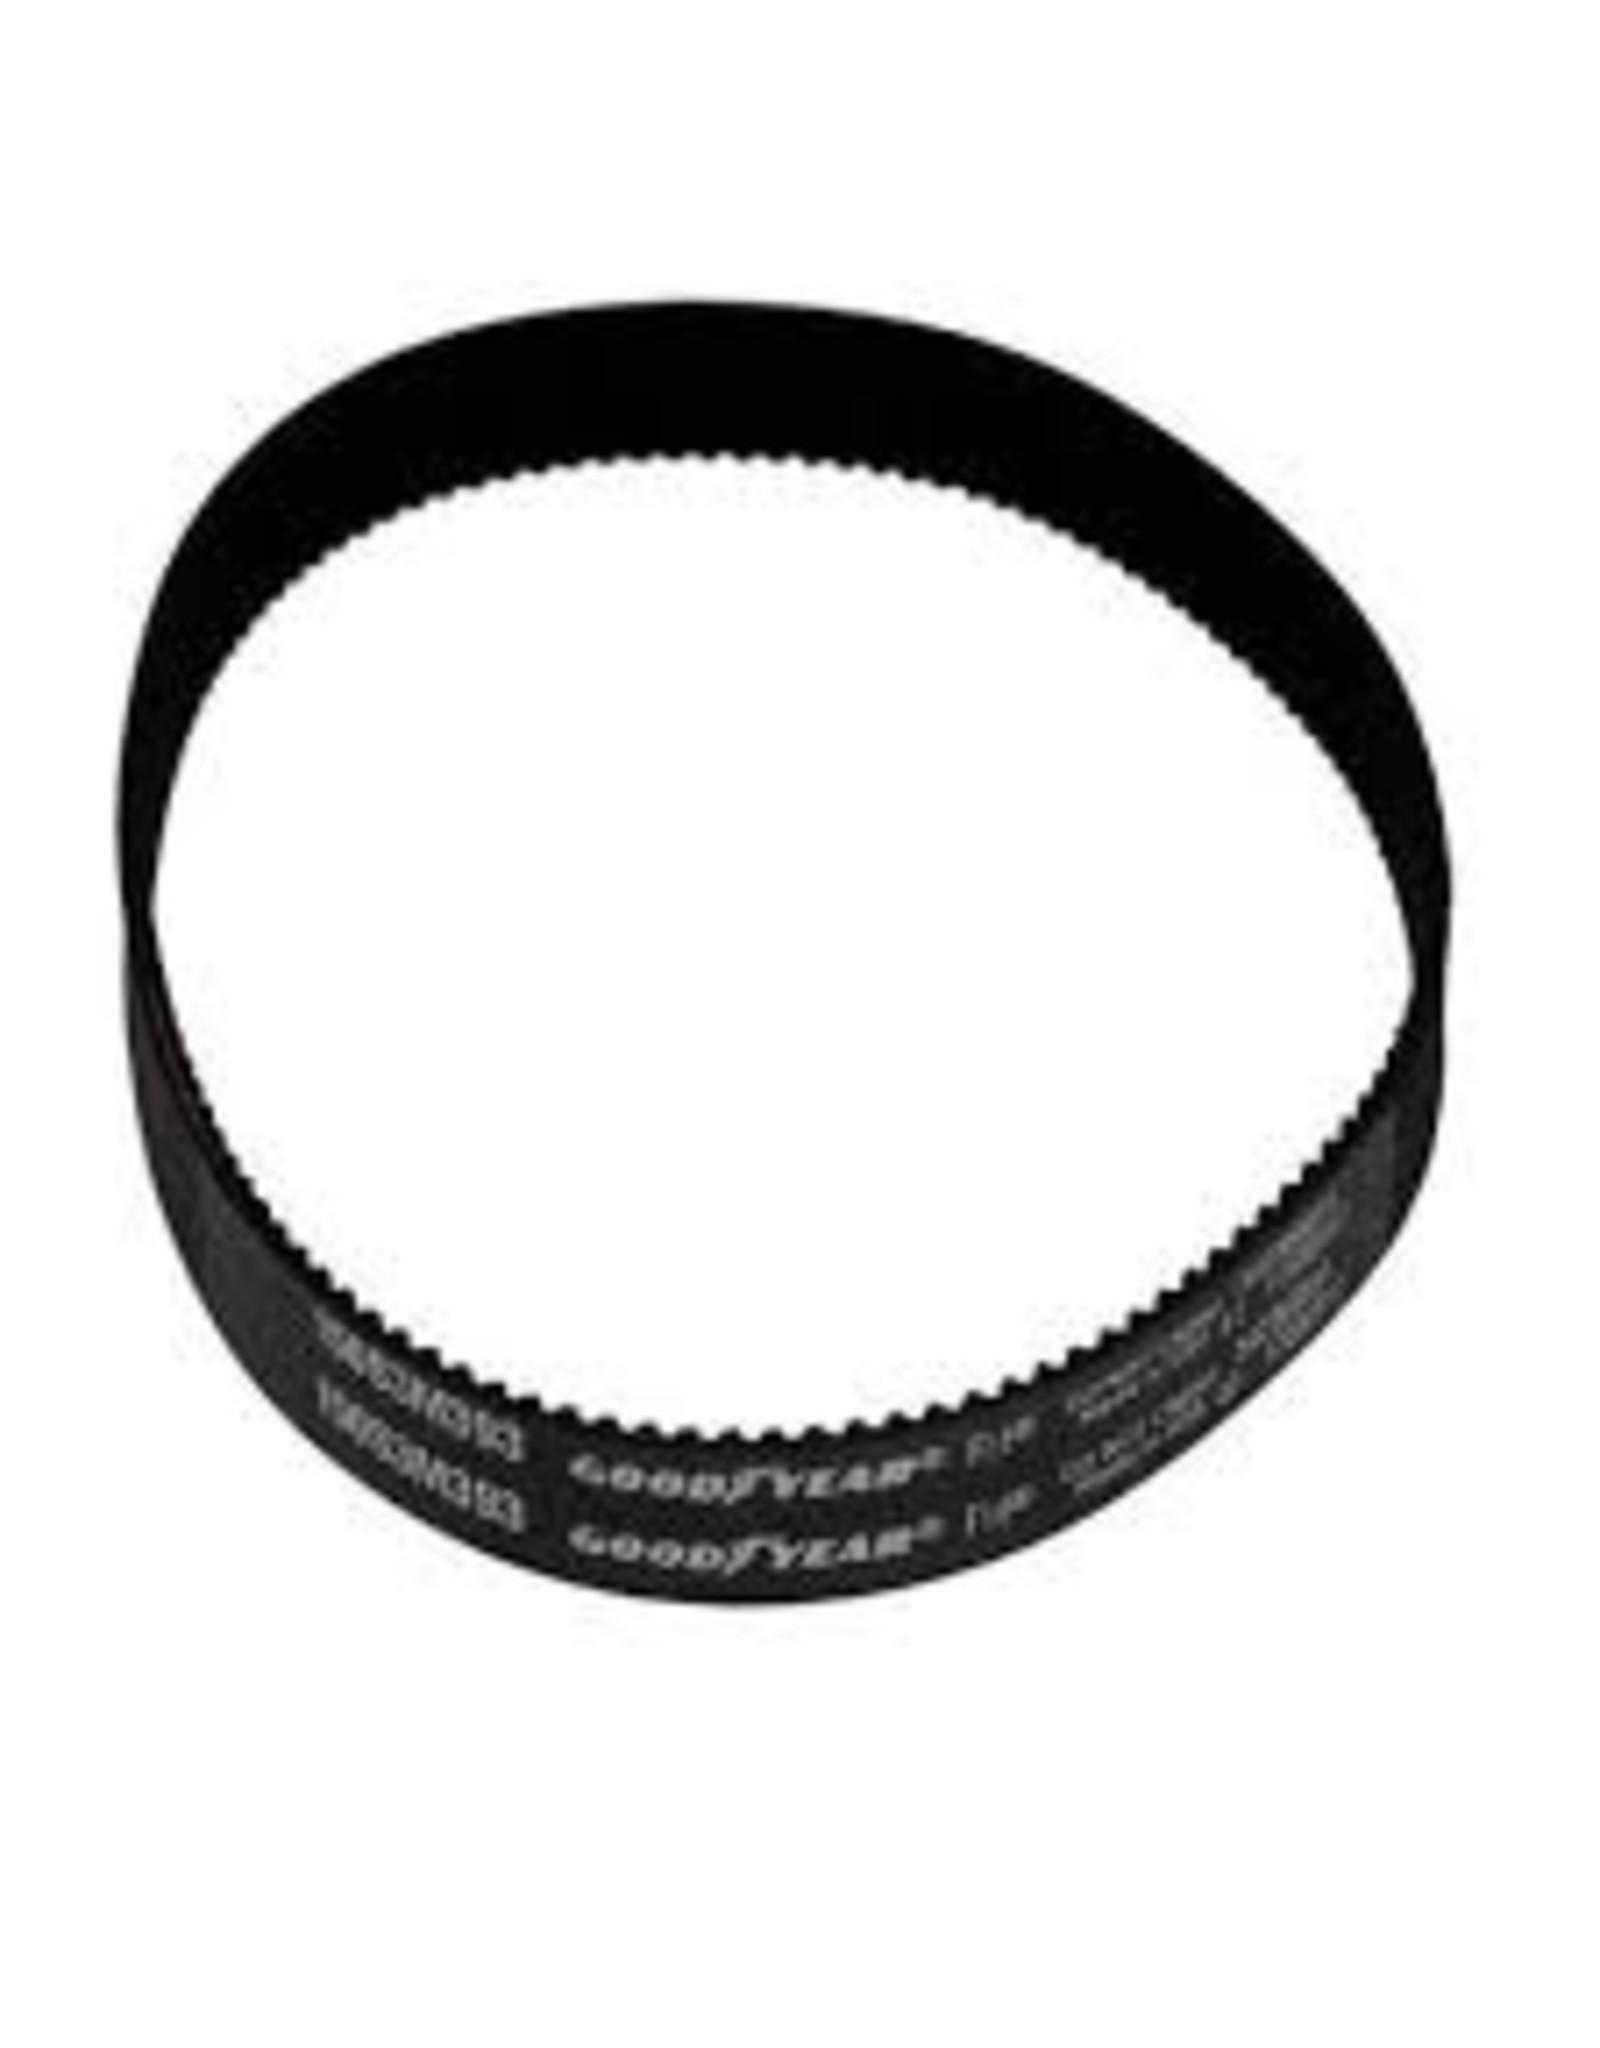 Graco 120234 Belt 3mm timing (pump drive)